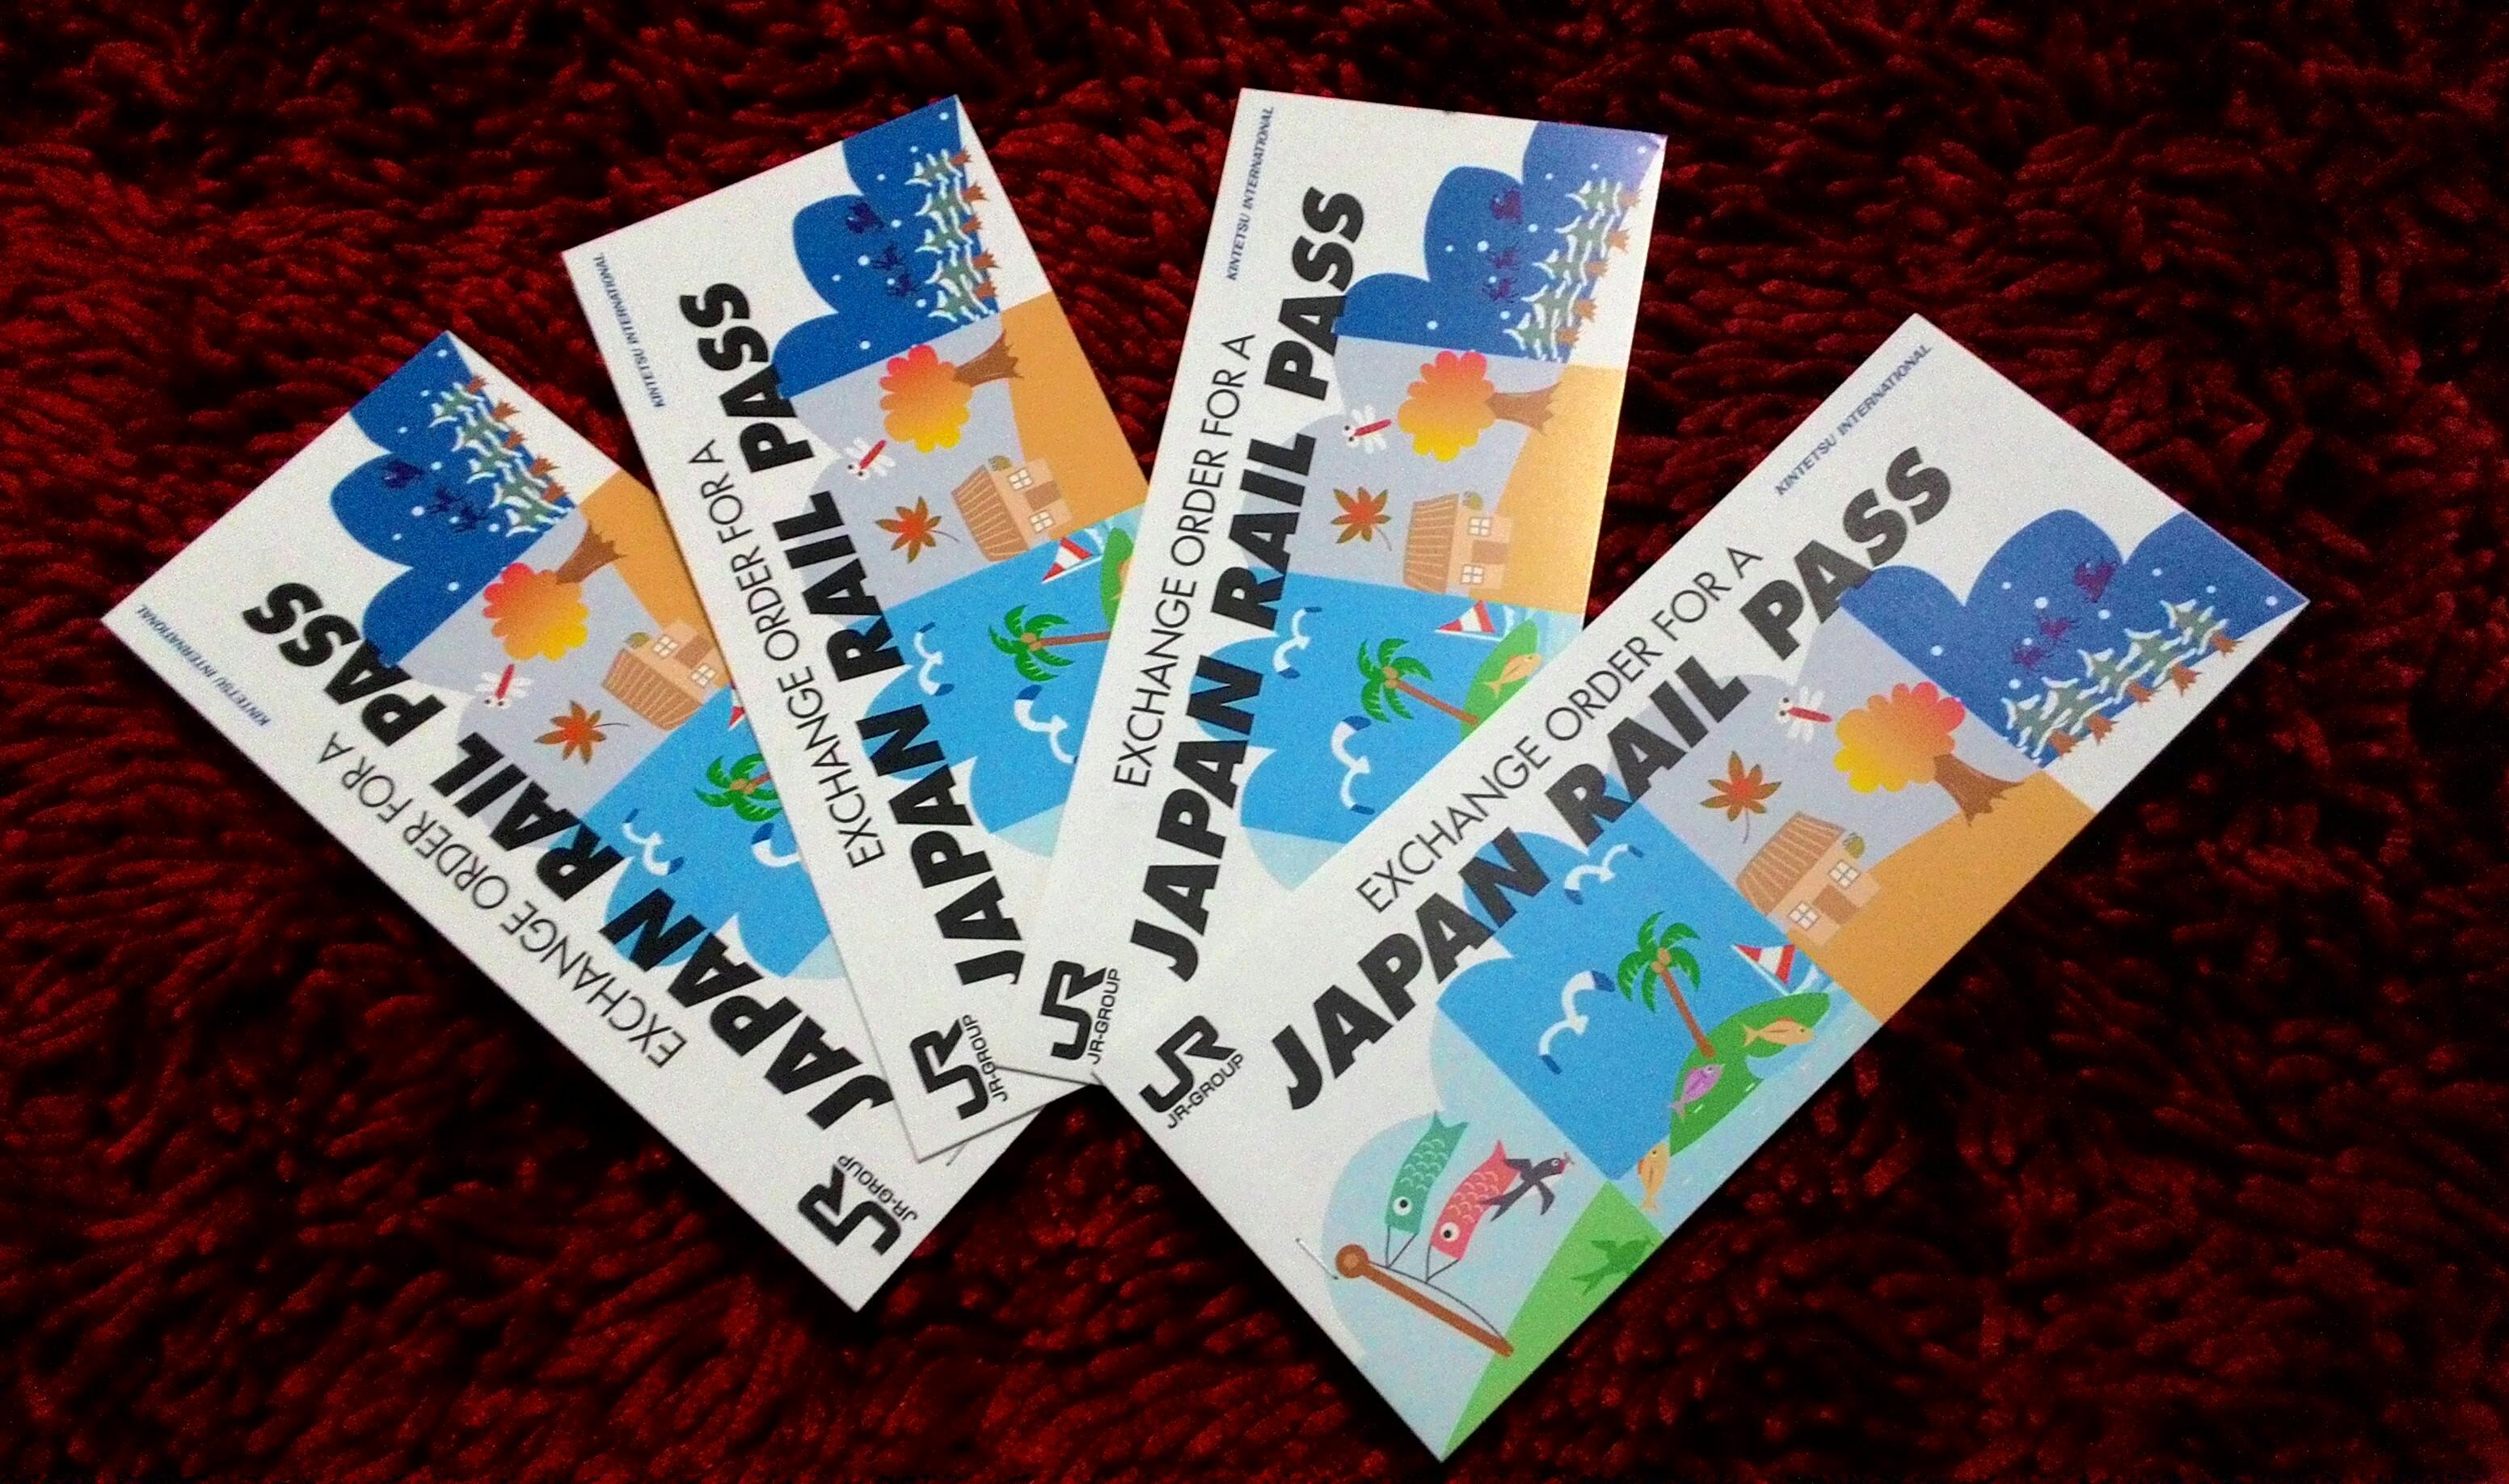 Japan Do It Yourself Cerita Yusnadi Tiket Jakarta Ke Jepang Pergi Pulang Dengan Garuda Indonesia Penghitungan